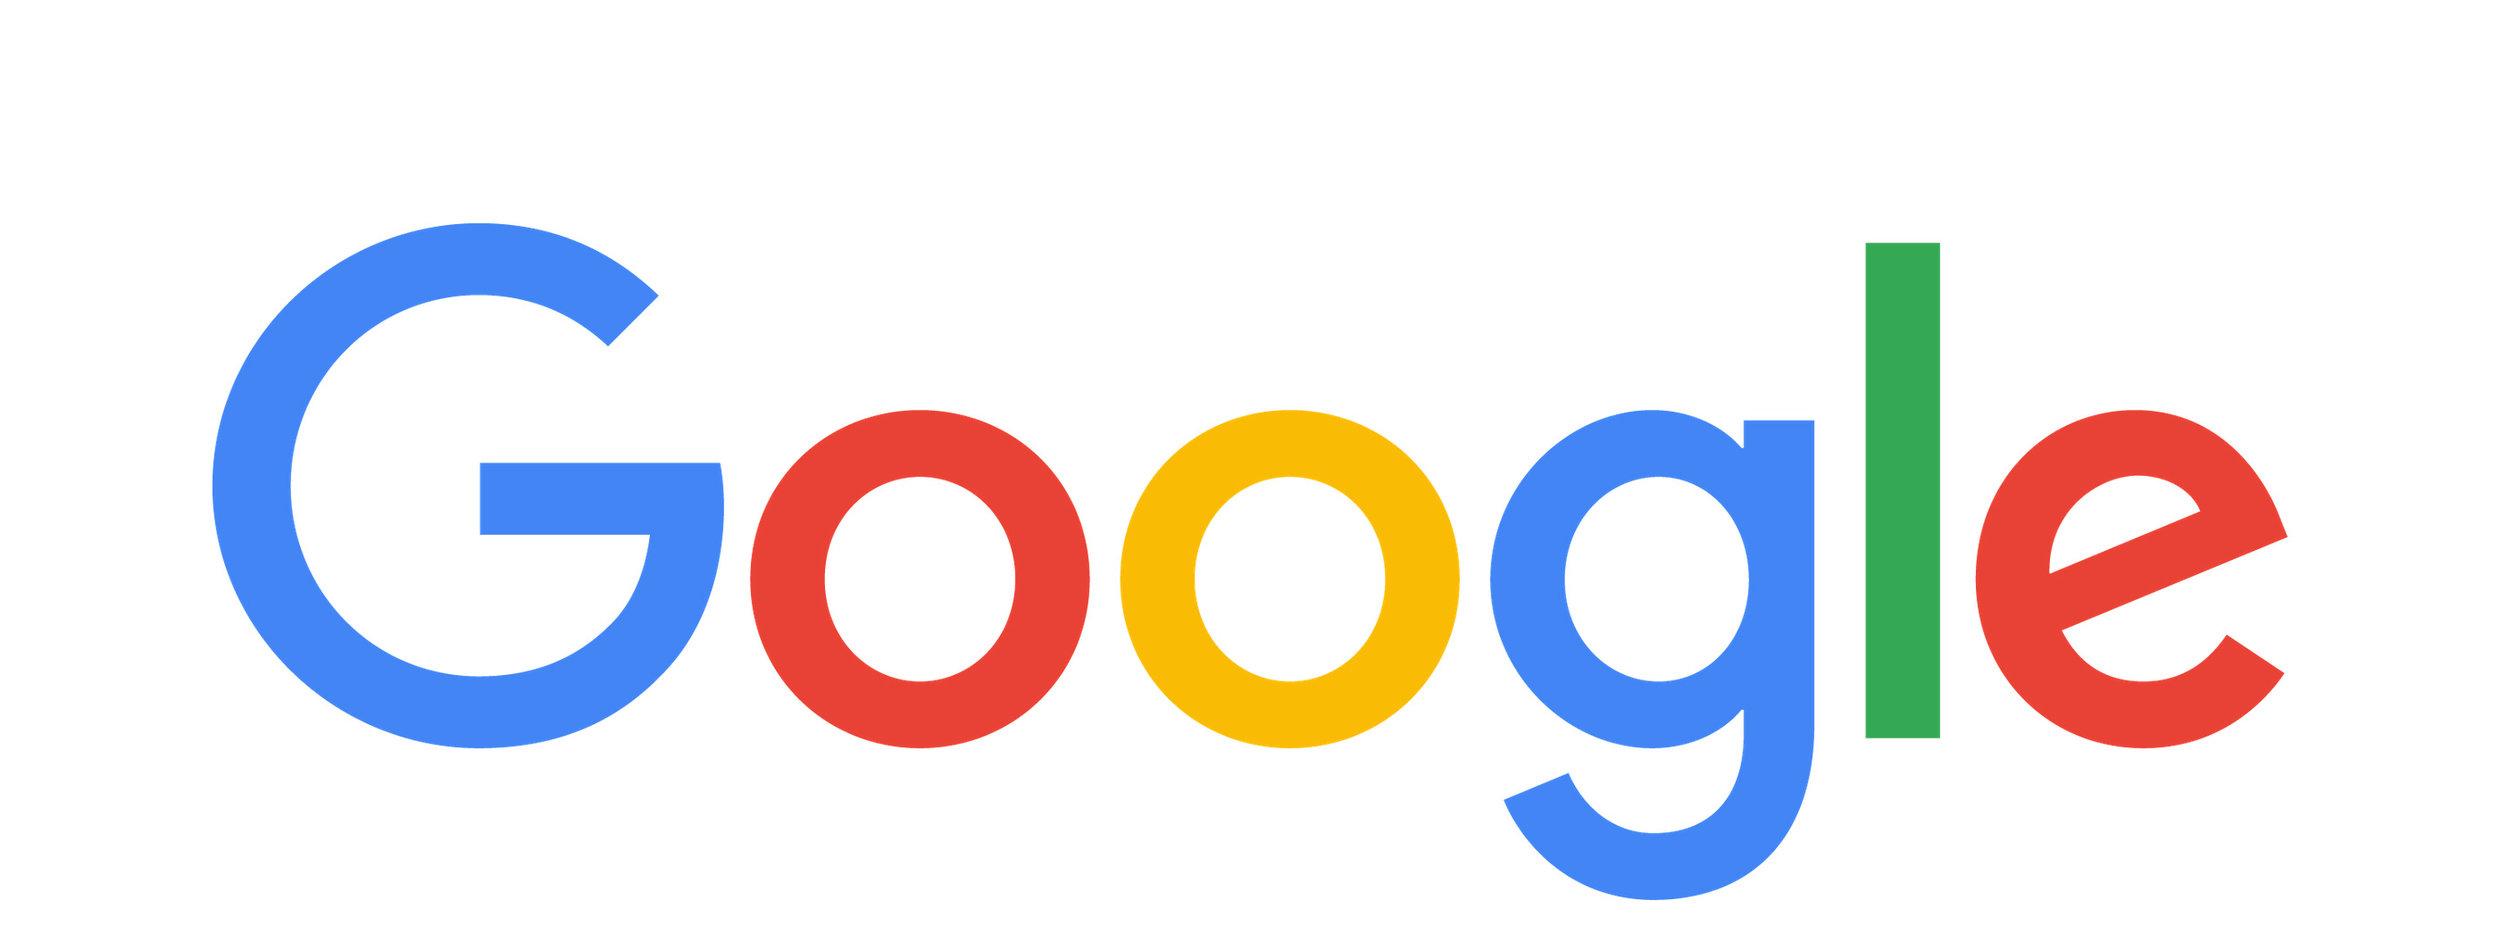 logo_Google_FullColor_3x_830x271px.max-2800x2800-3.jpg